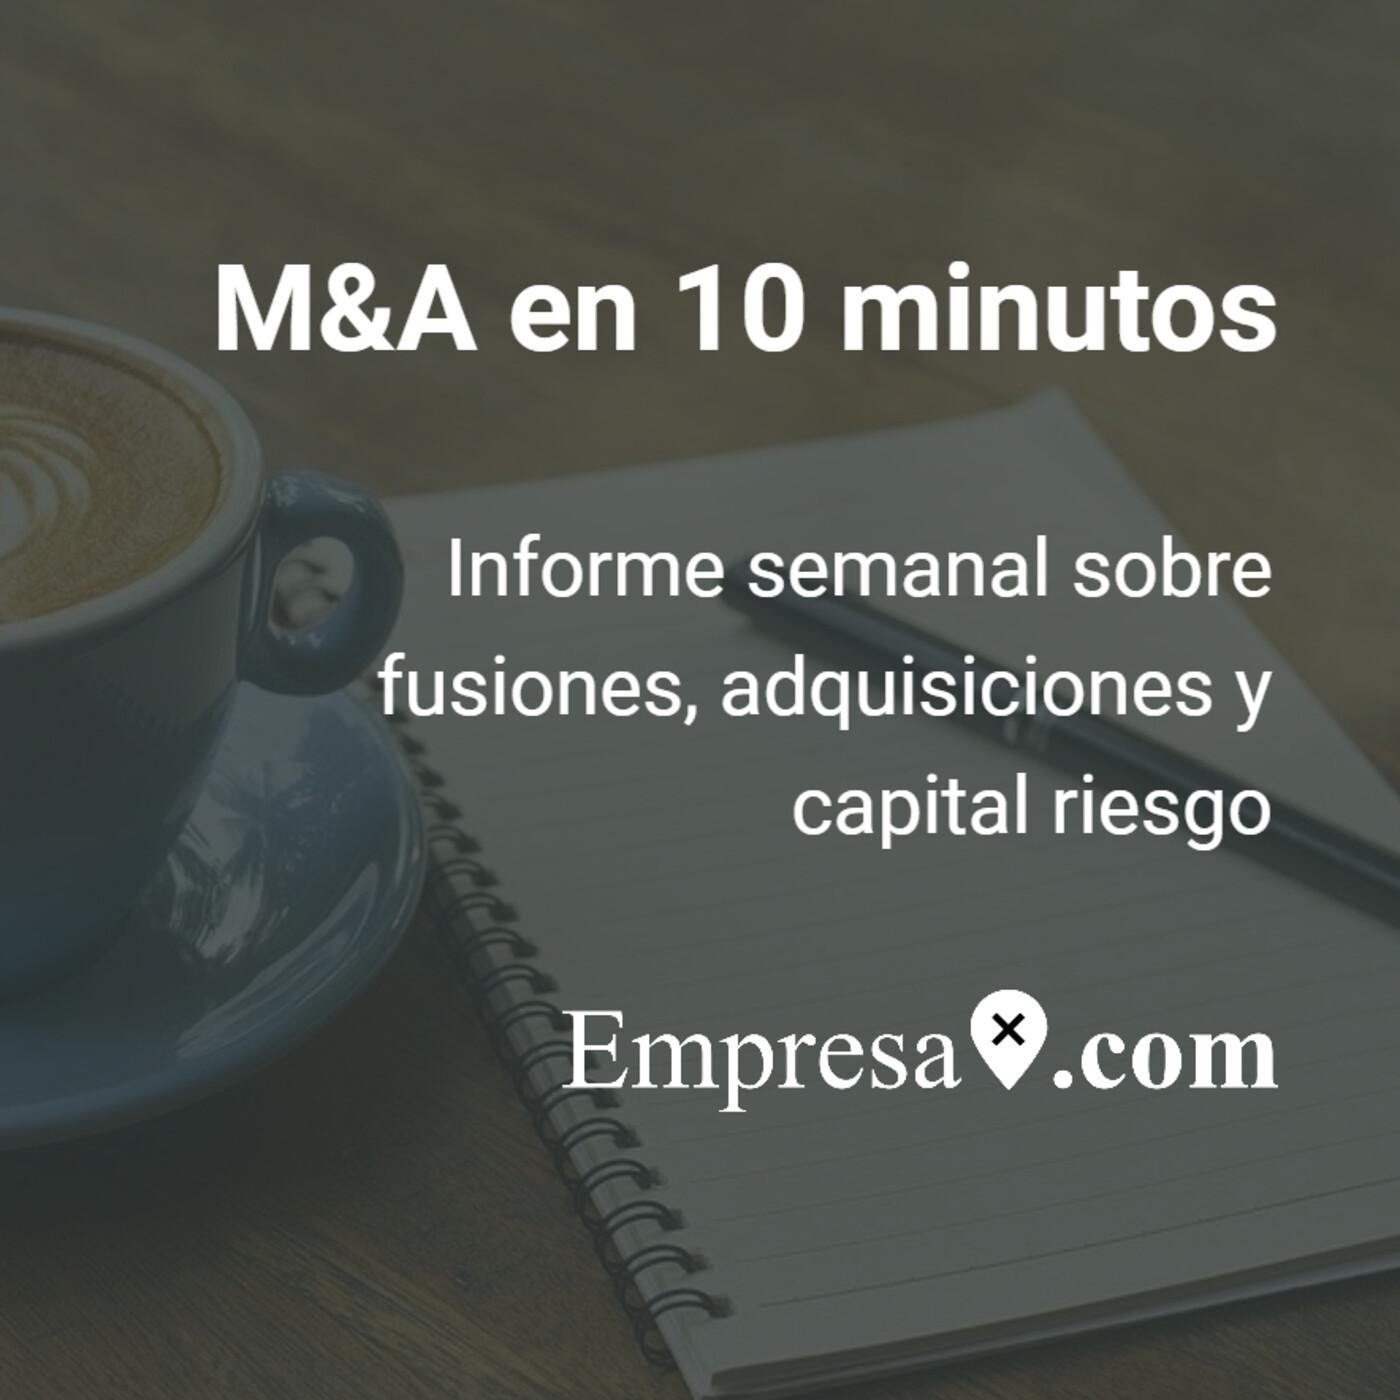 M&A en 10 minutos: Symborg, Izertis, Making Science, Gigas, Salto...